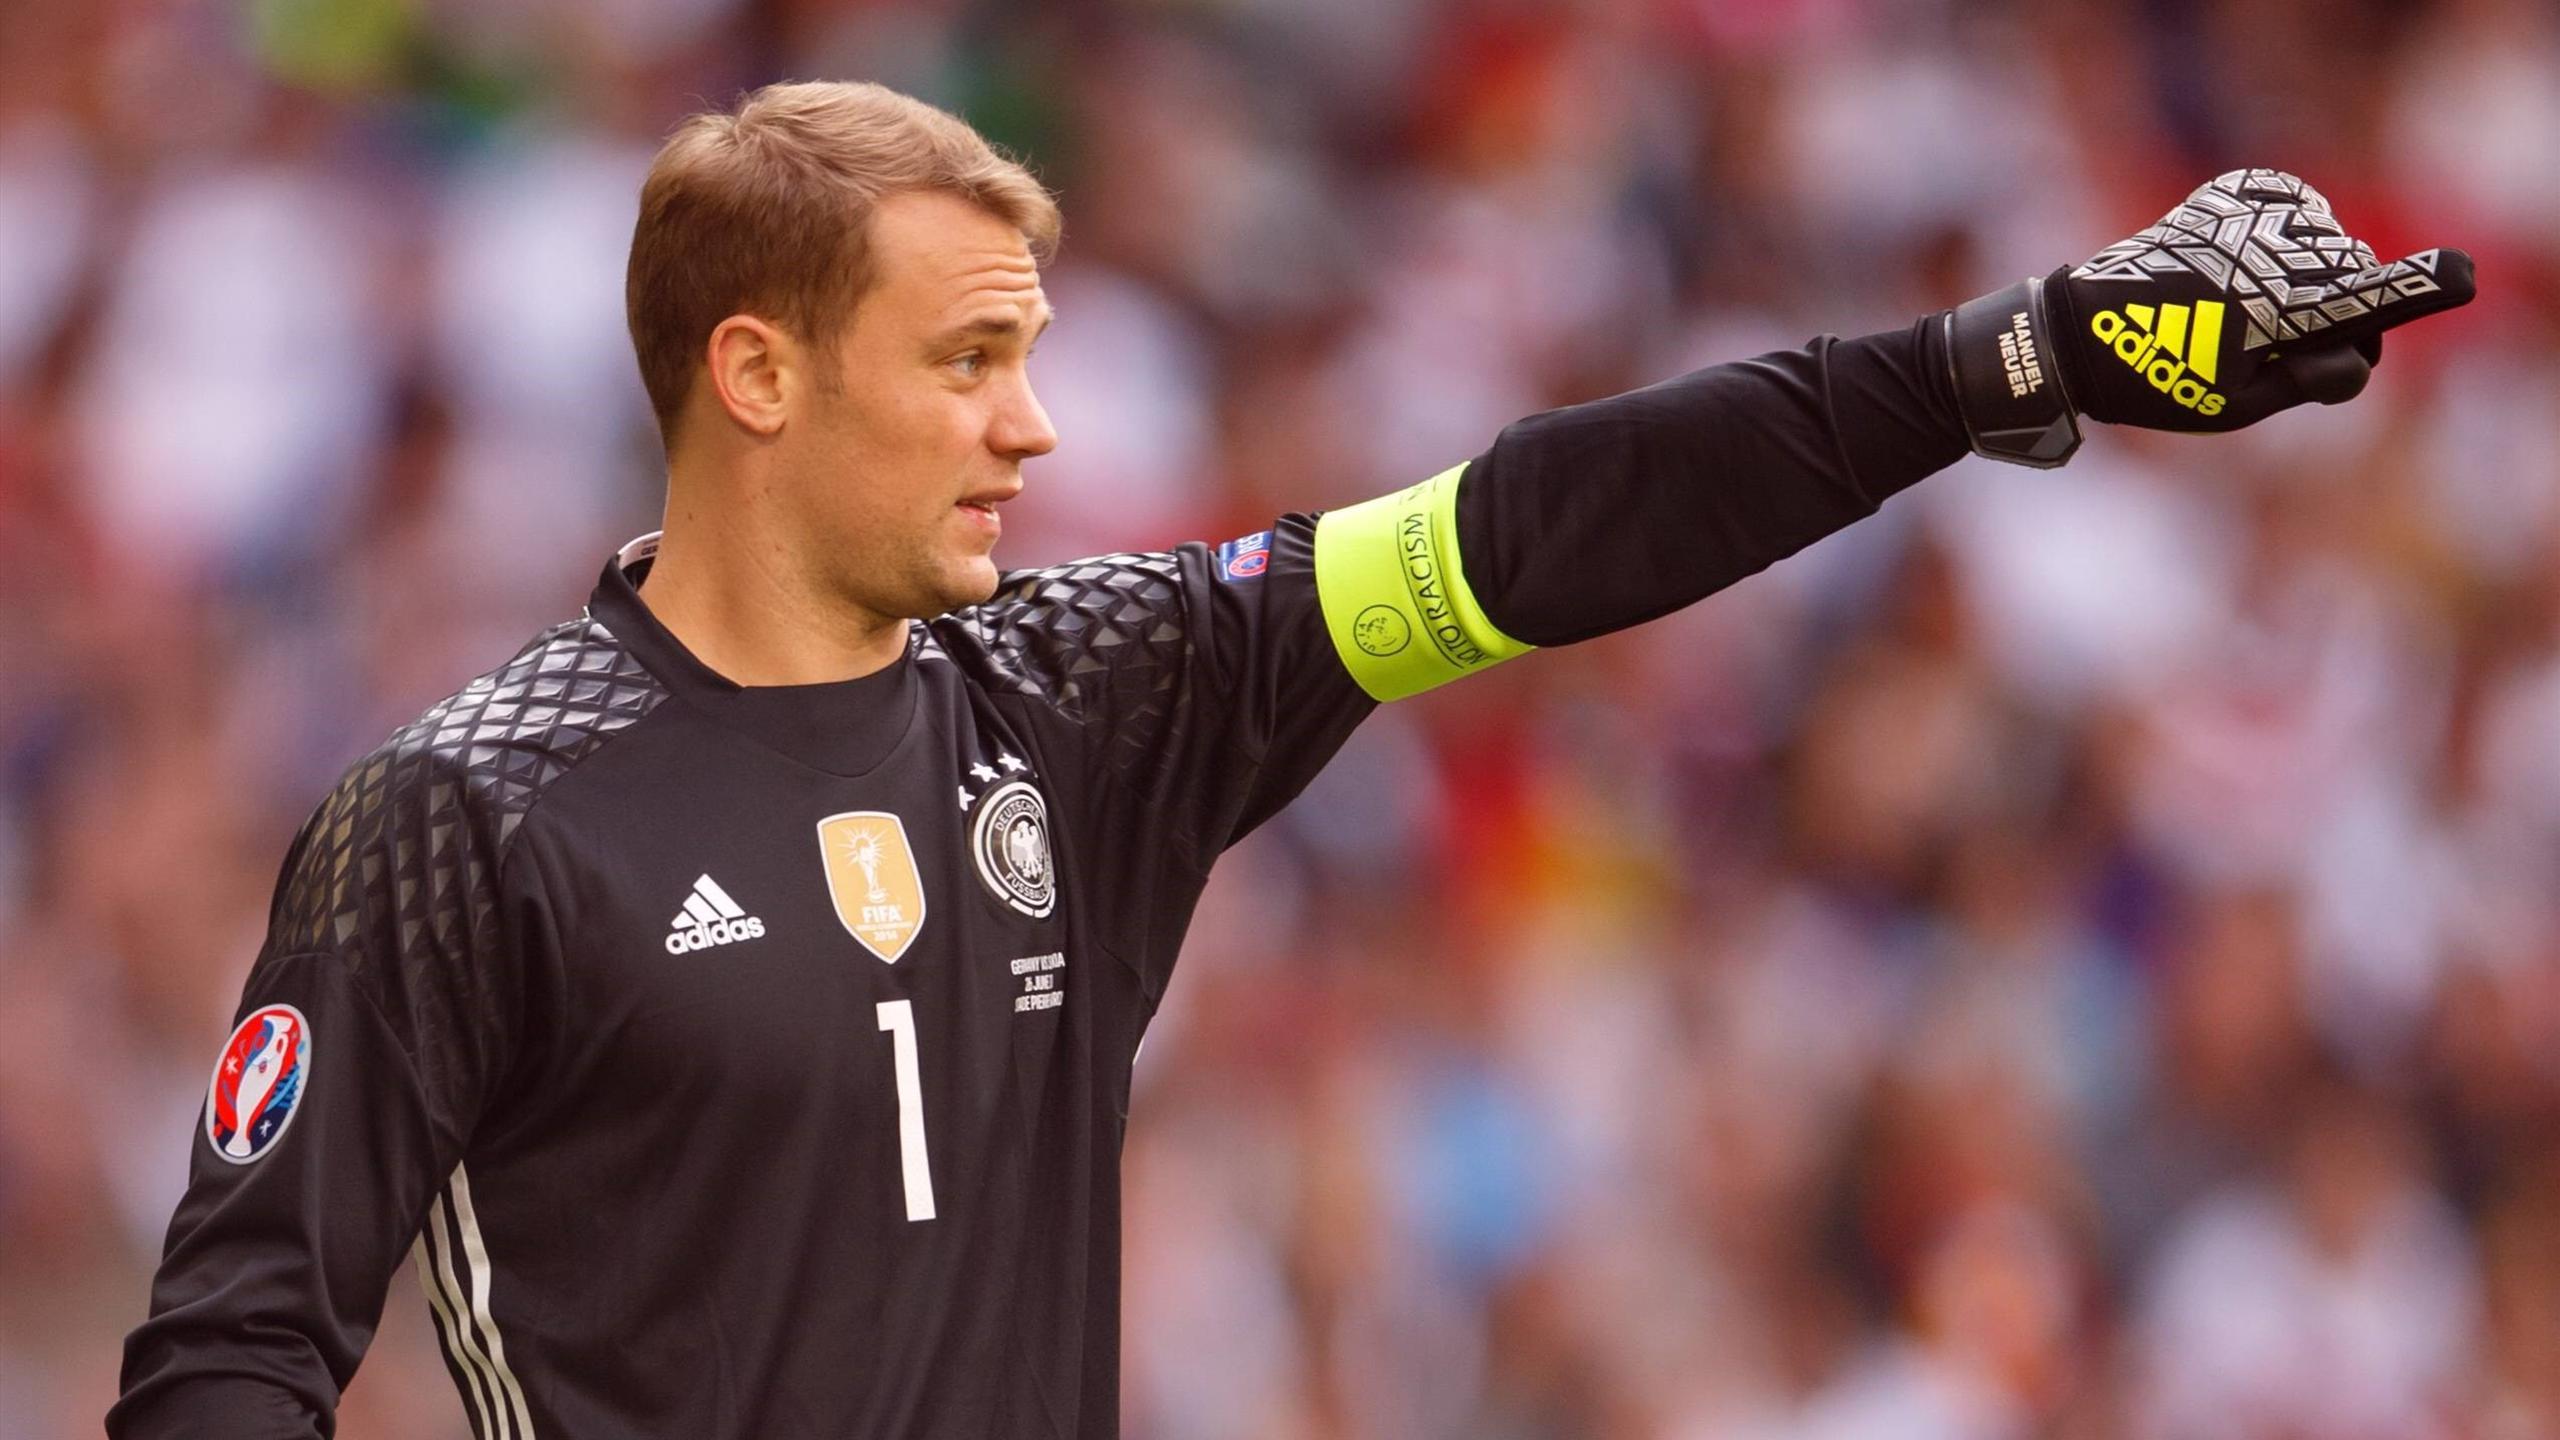 EM 2016: Deutschland gegen Italien bedeutet auch Manuel Neuer gegen ...